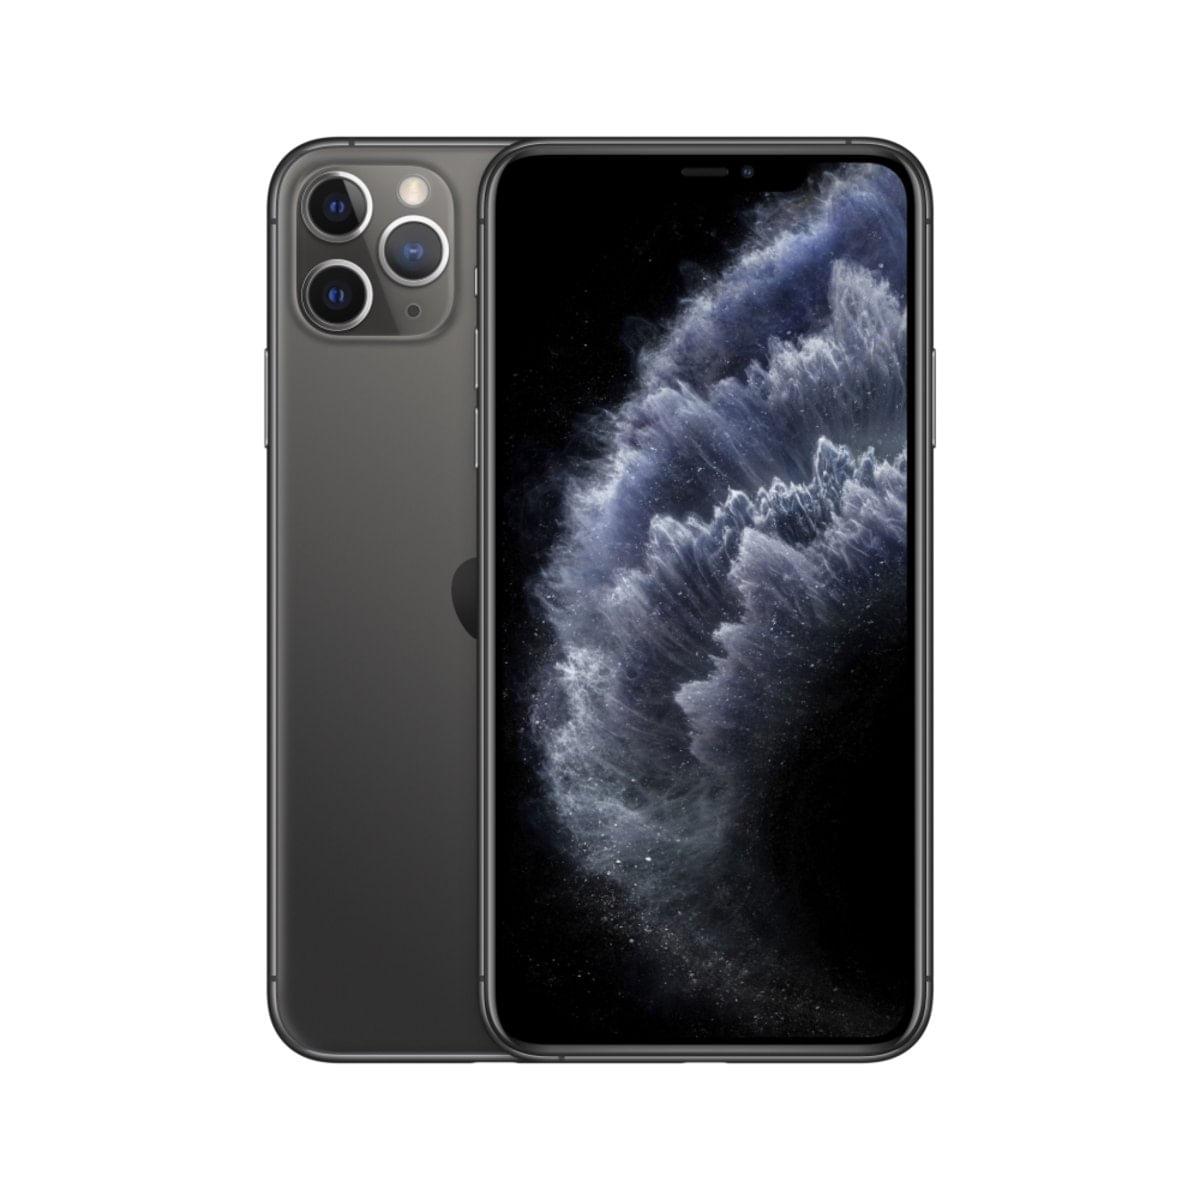 Menor preço em iPhone 11 Pro Max 64GB - Cinza Espacial